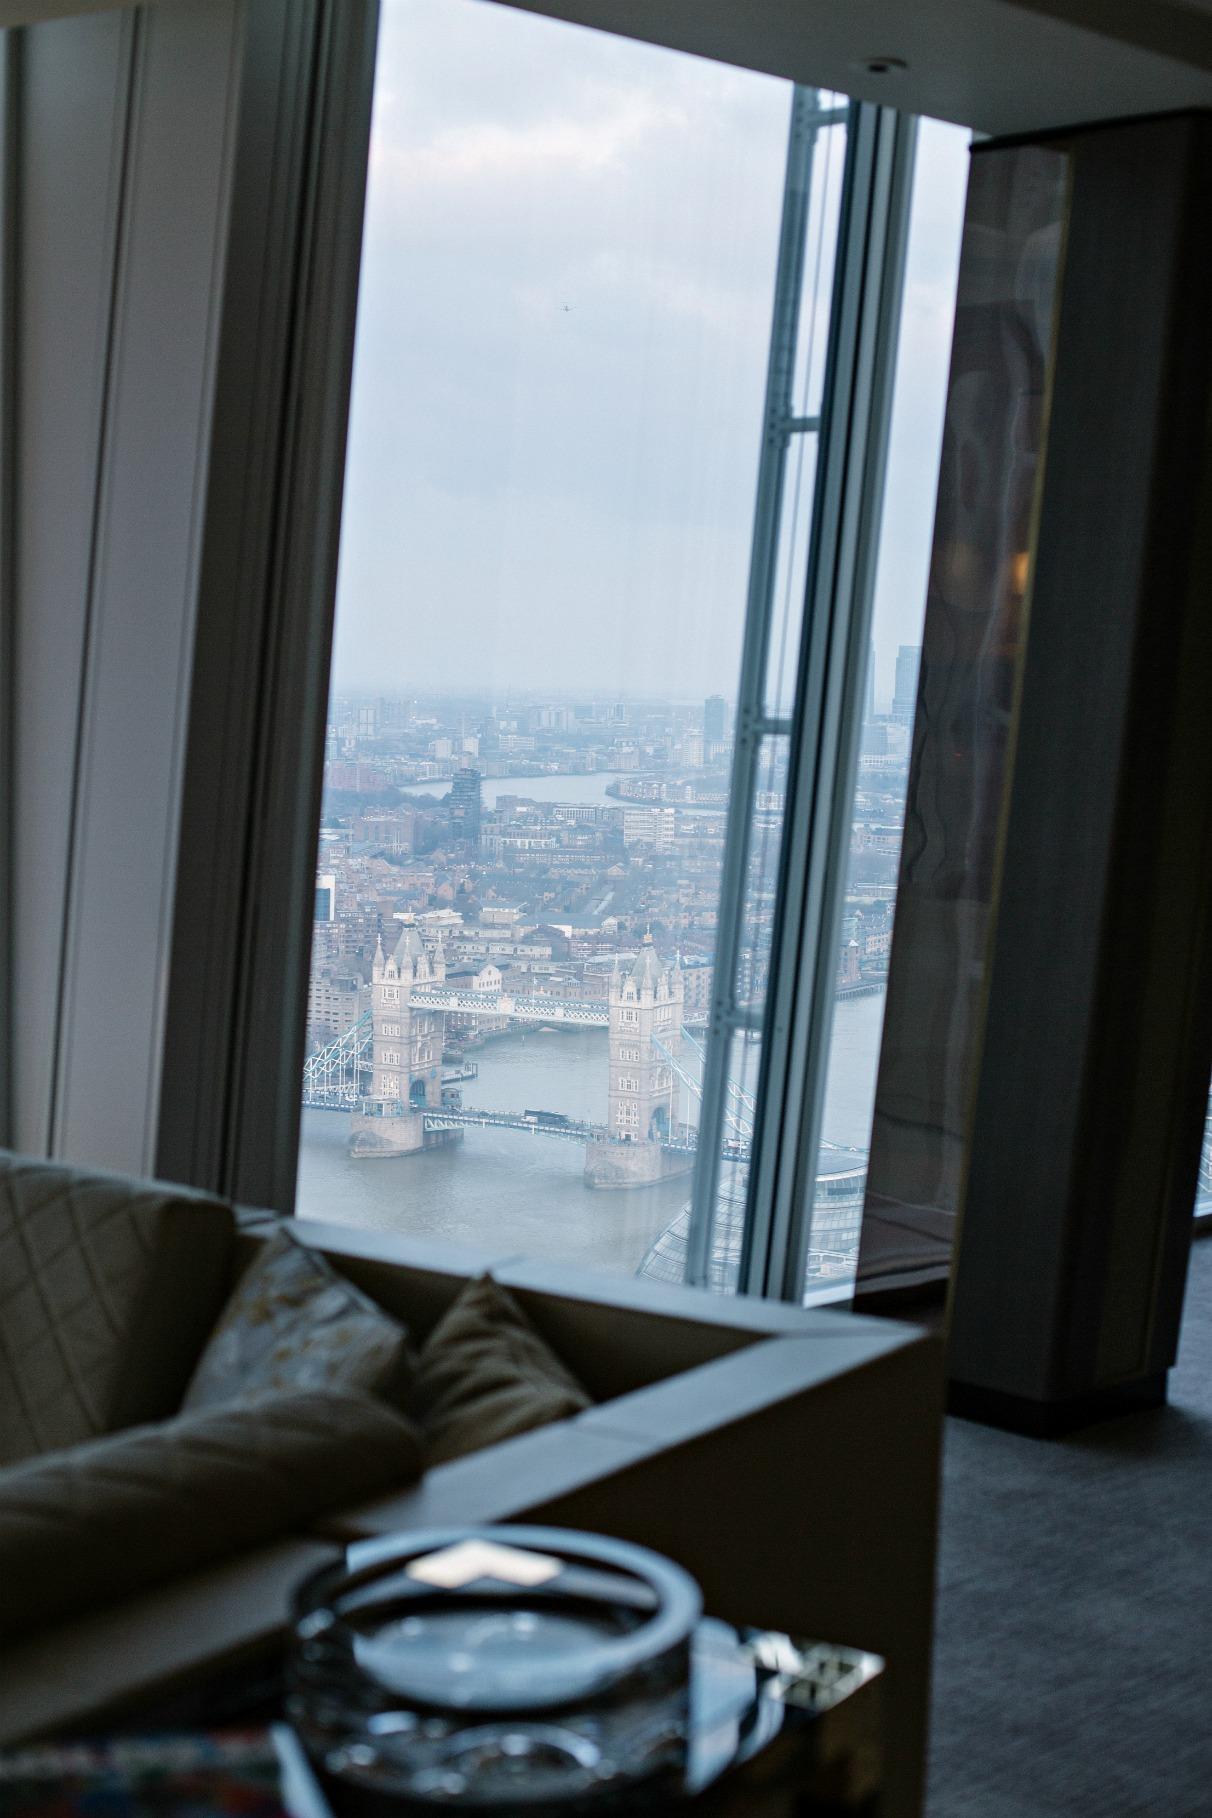 disi-couture-travel-shangri-la-hotel-shard-london-tower-bridge-england-edisa-shahini-03